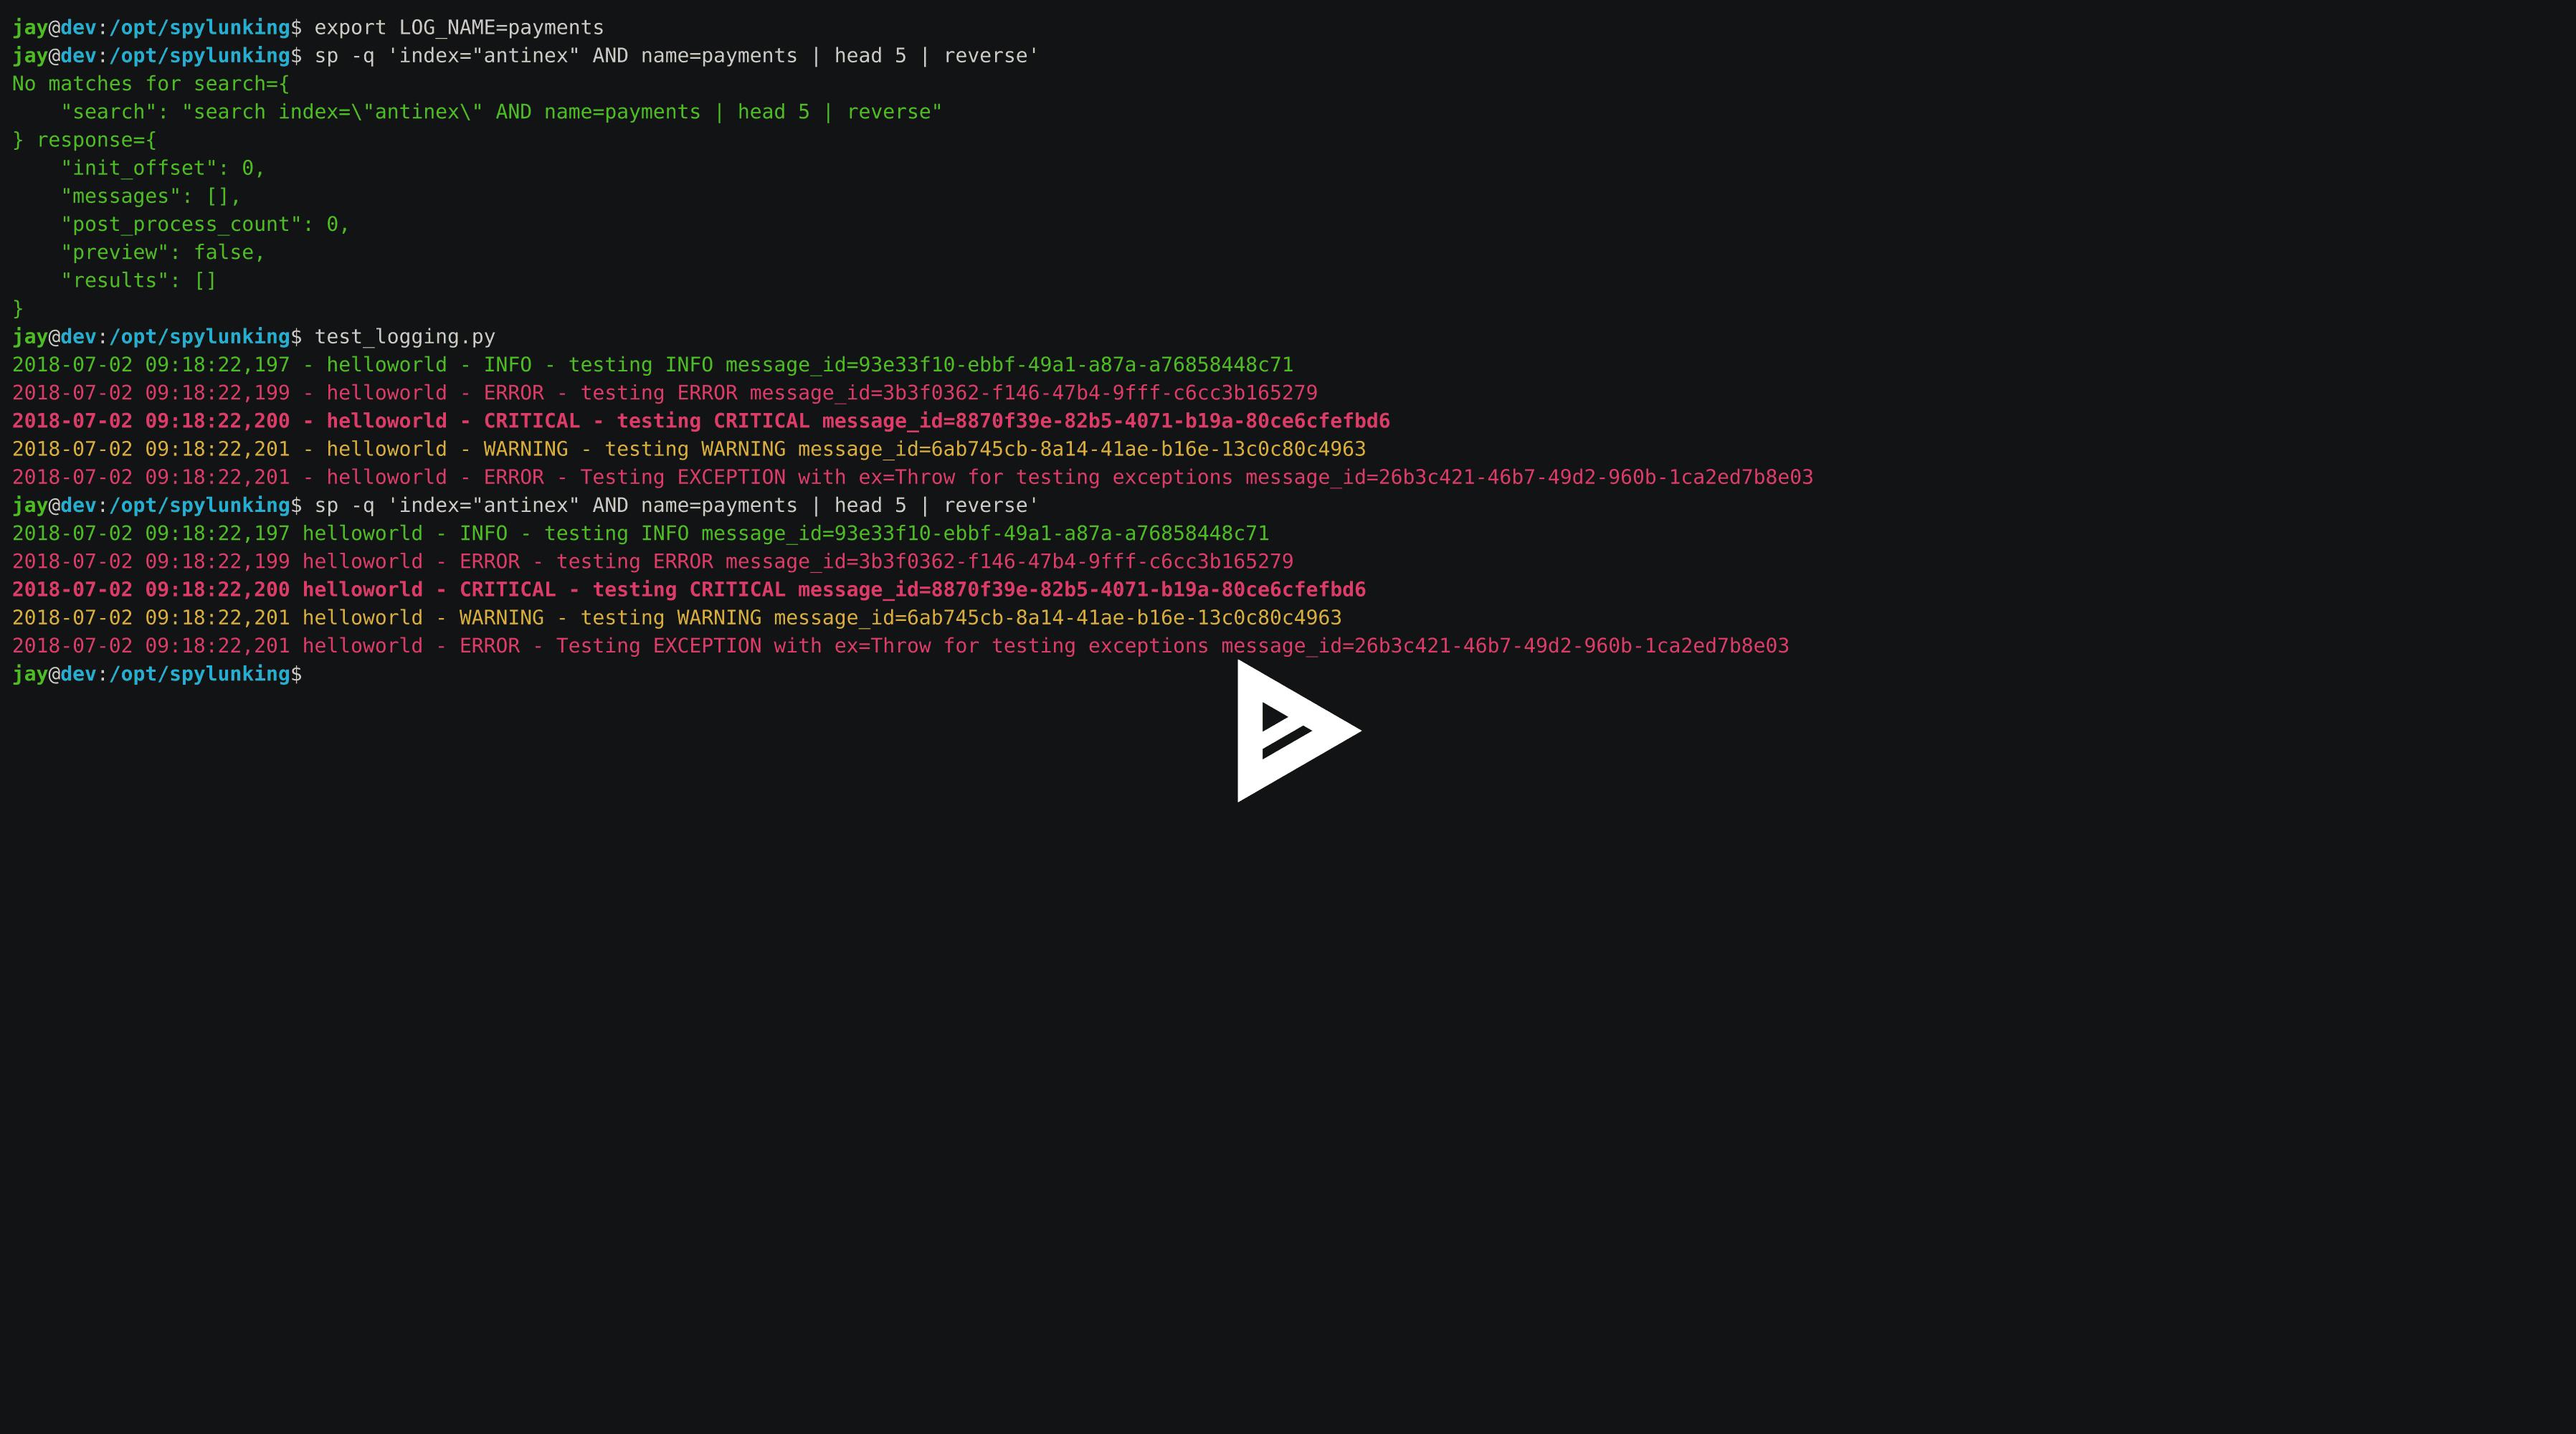 Publishing Logs to Splunk using the Spylunking Logger